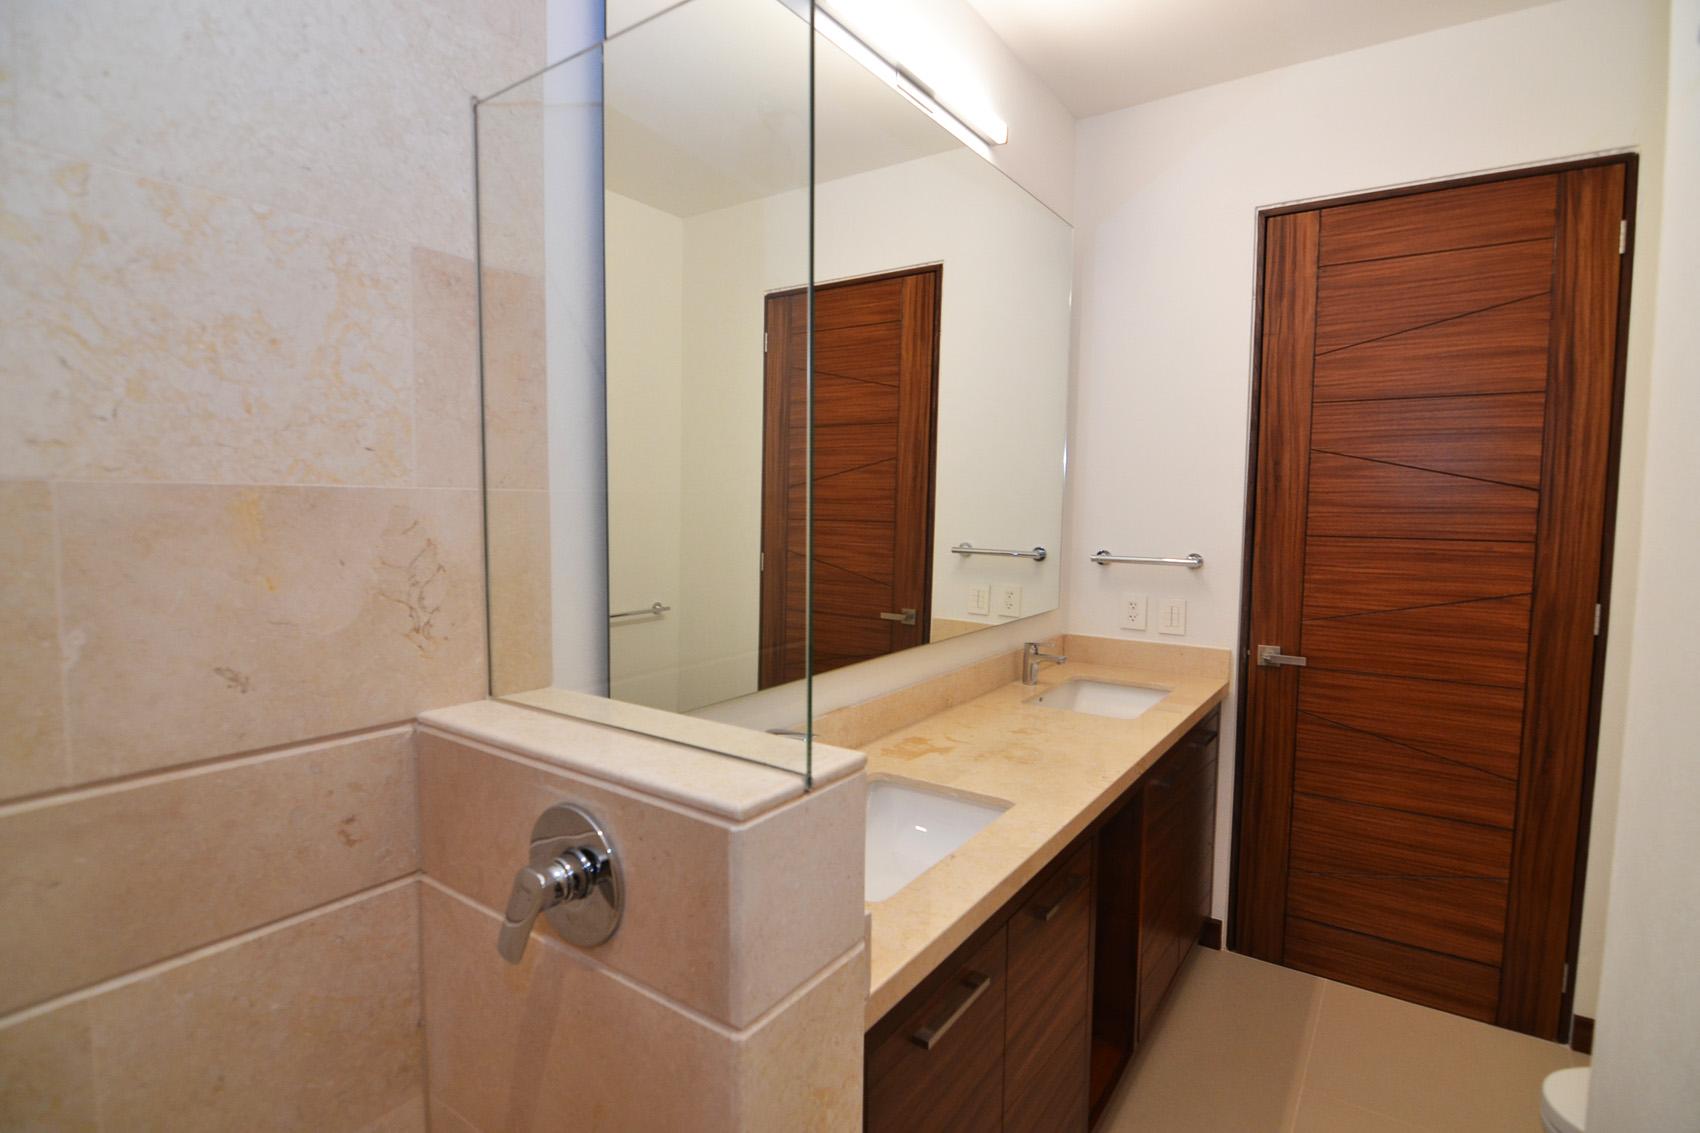 Condo VMarina PH10 - Puerto Vallarta Luxury Condo For Rent (16)